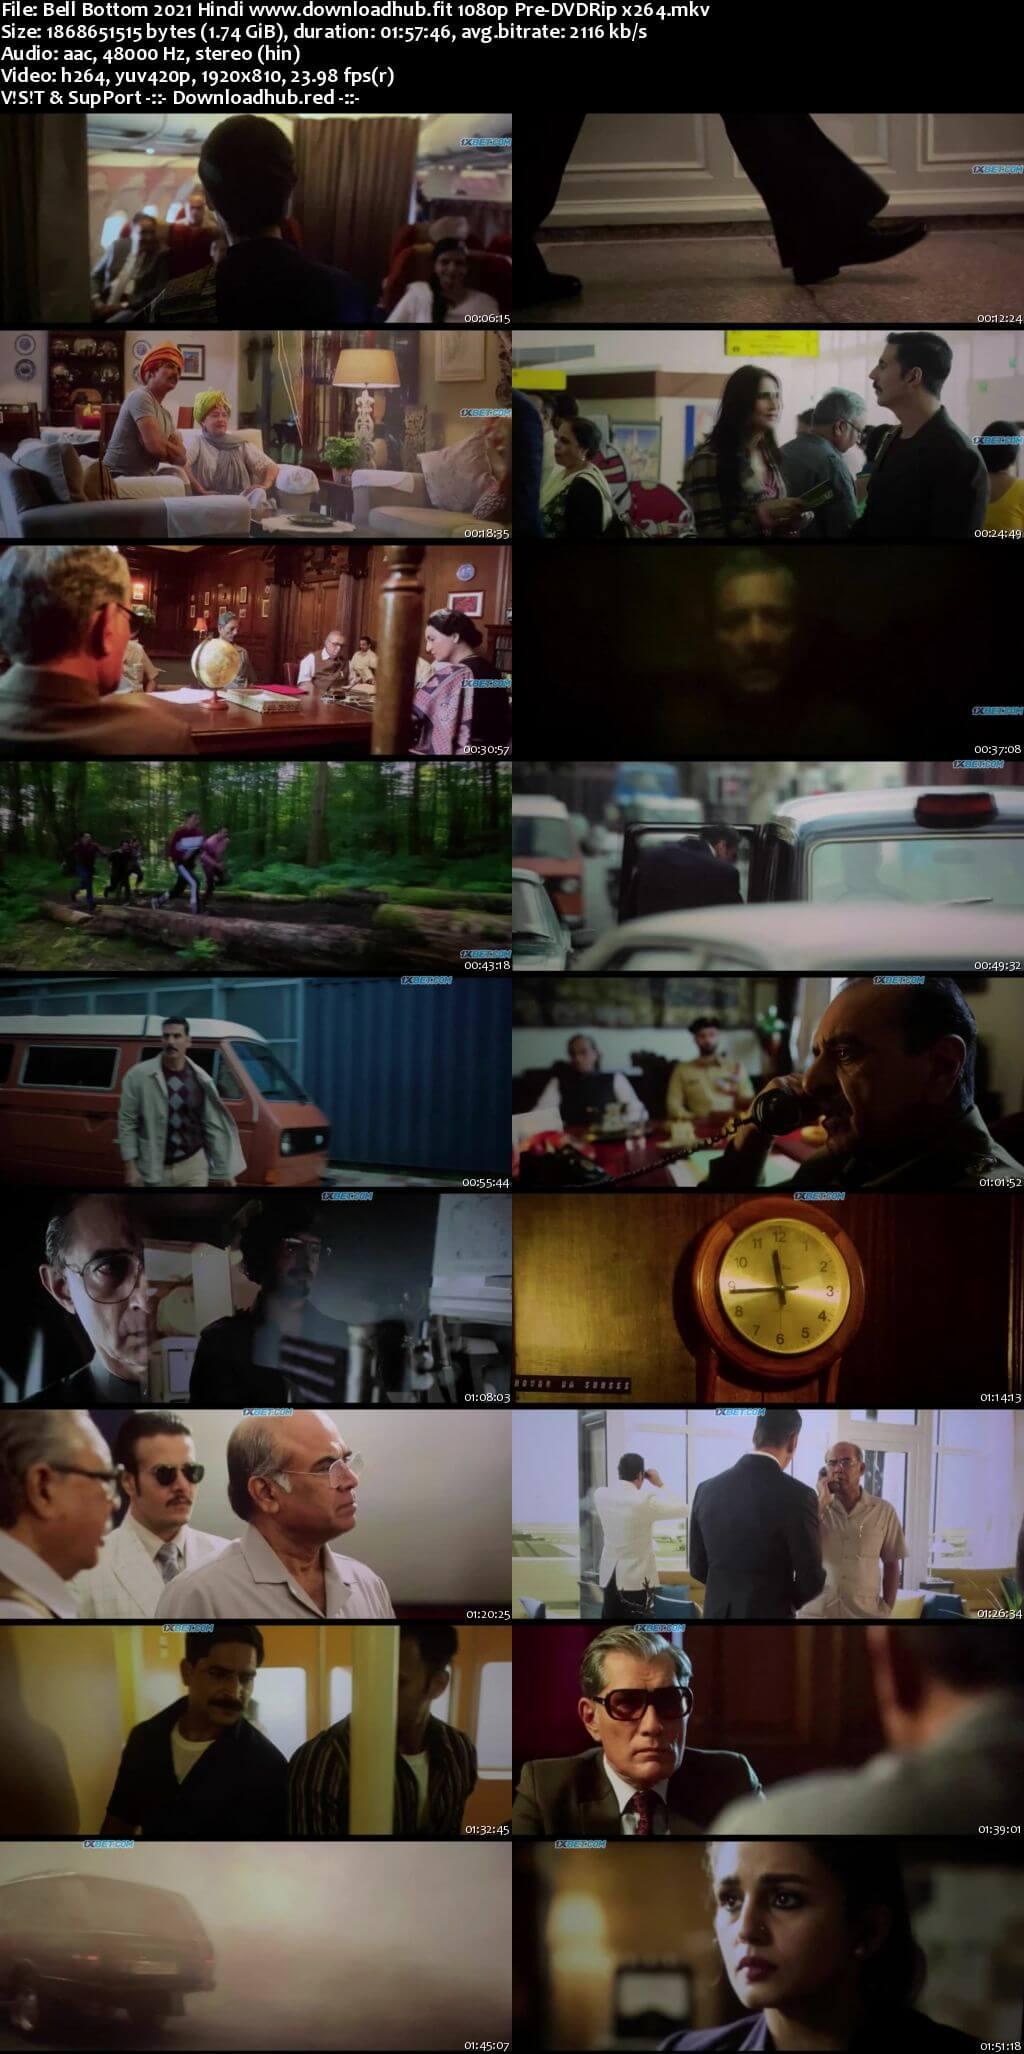 Bell Bottom 2021 Hindi 1080p 720p 480p Pre-DVDRip x264